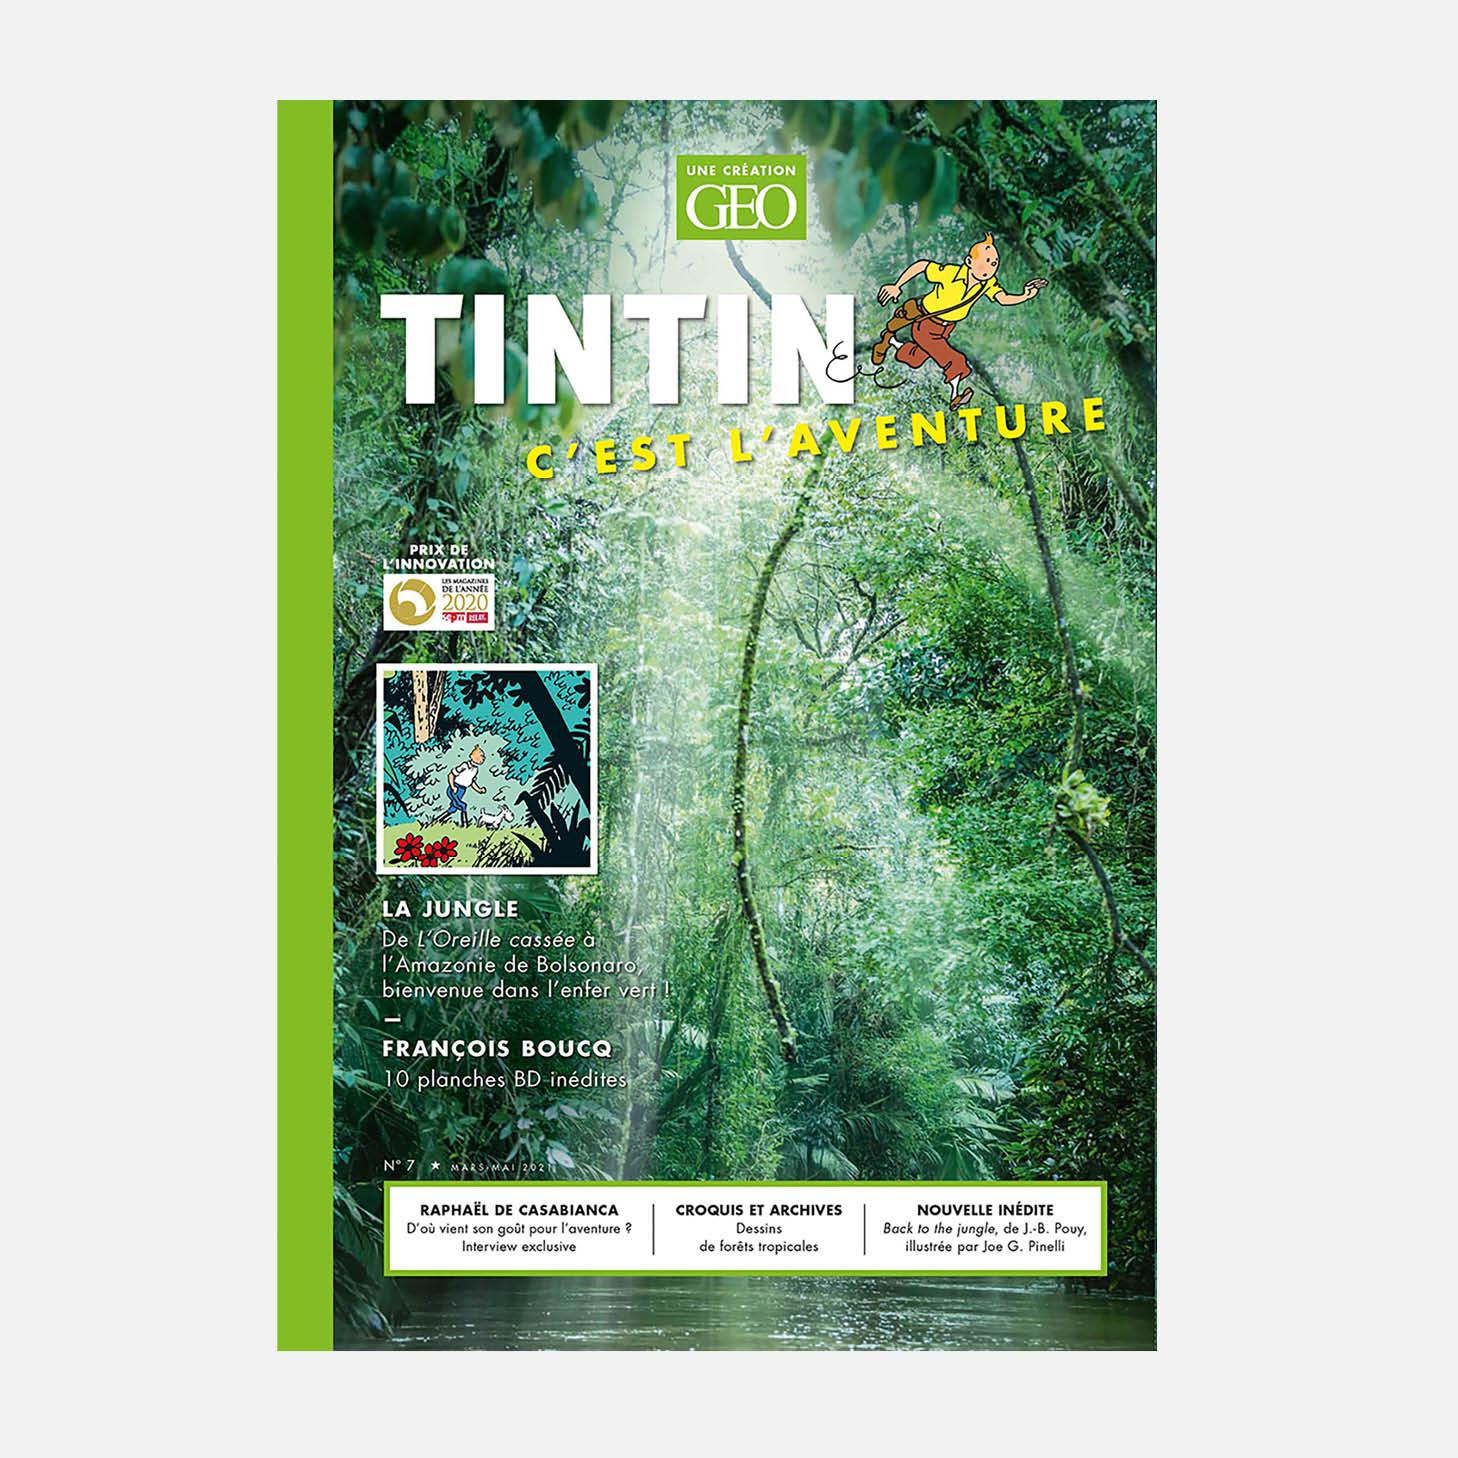 Tintin c'est l'Aventure n°7 : Dans l'enfer vert avec Tintin